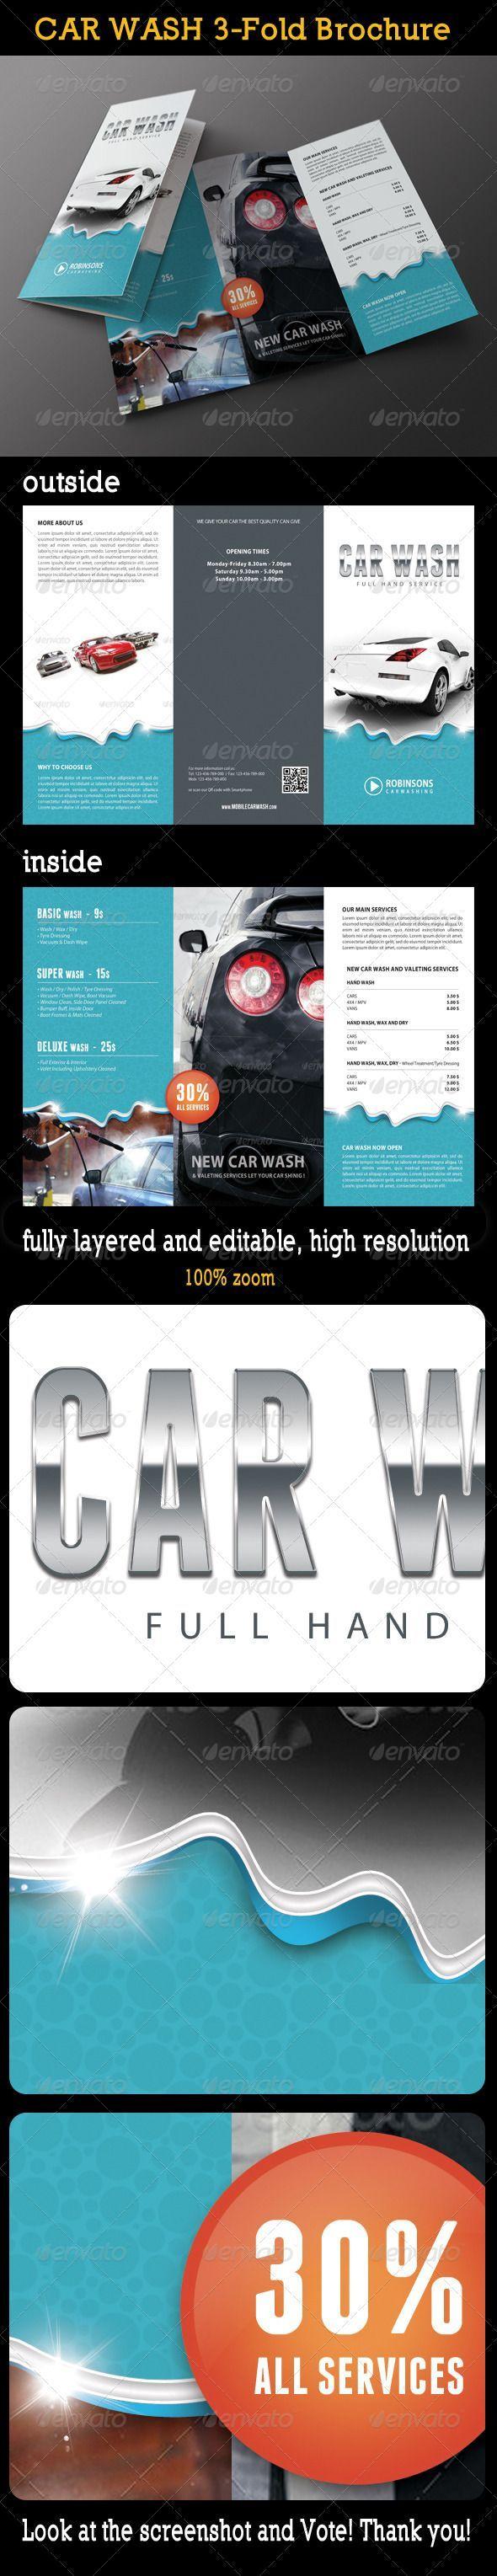 37 best car wash images on pinterest lavado de coches lavado de car wash auto detailing services or car wash equipment highly editable psd brochure template solutioingenieria Images